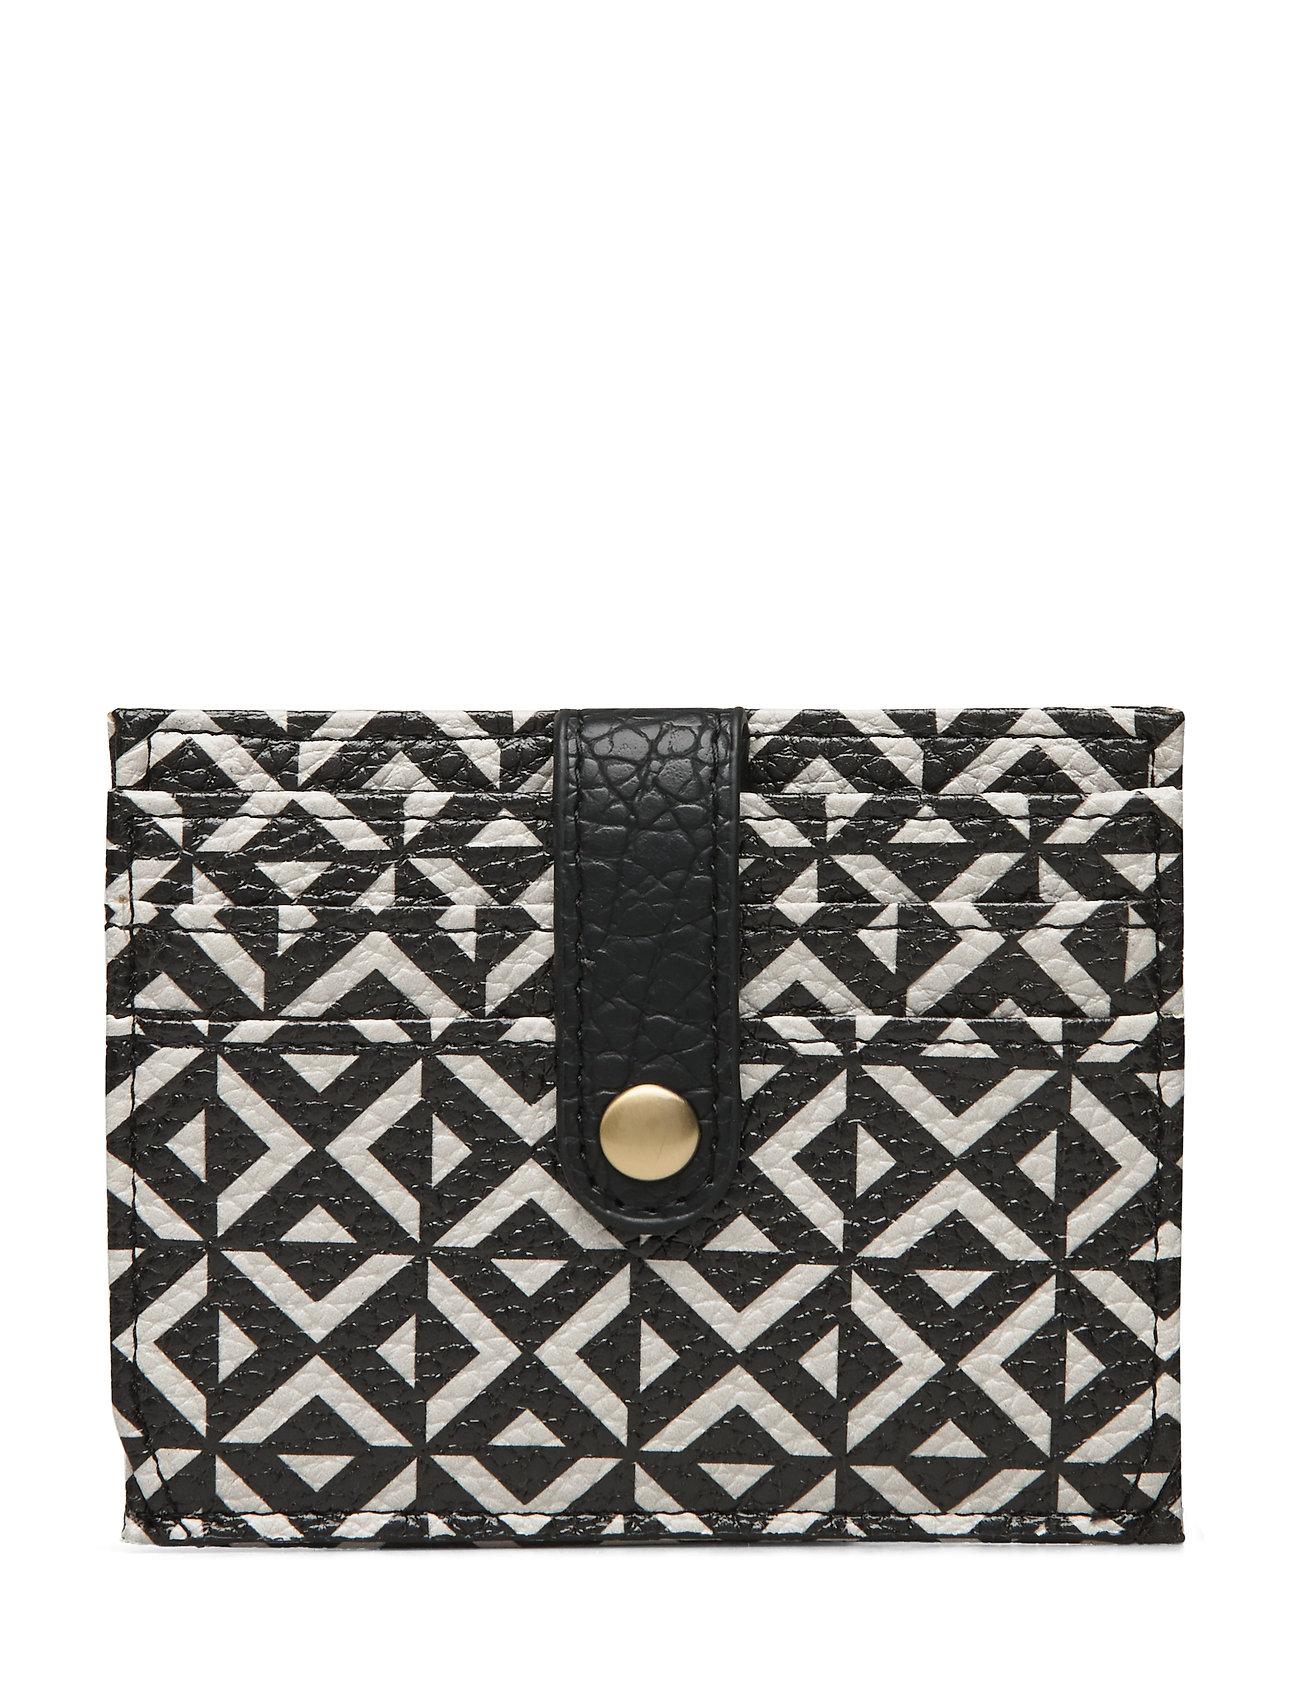 Image of Stile Card Pipol Holder Square B&W Bags Card Holders & Wallets Card Holder Sort PIPOL'S BAZAAR (3309259861)